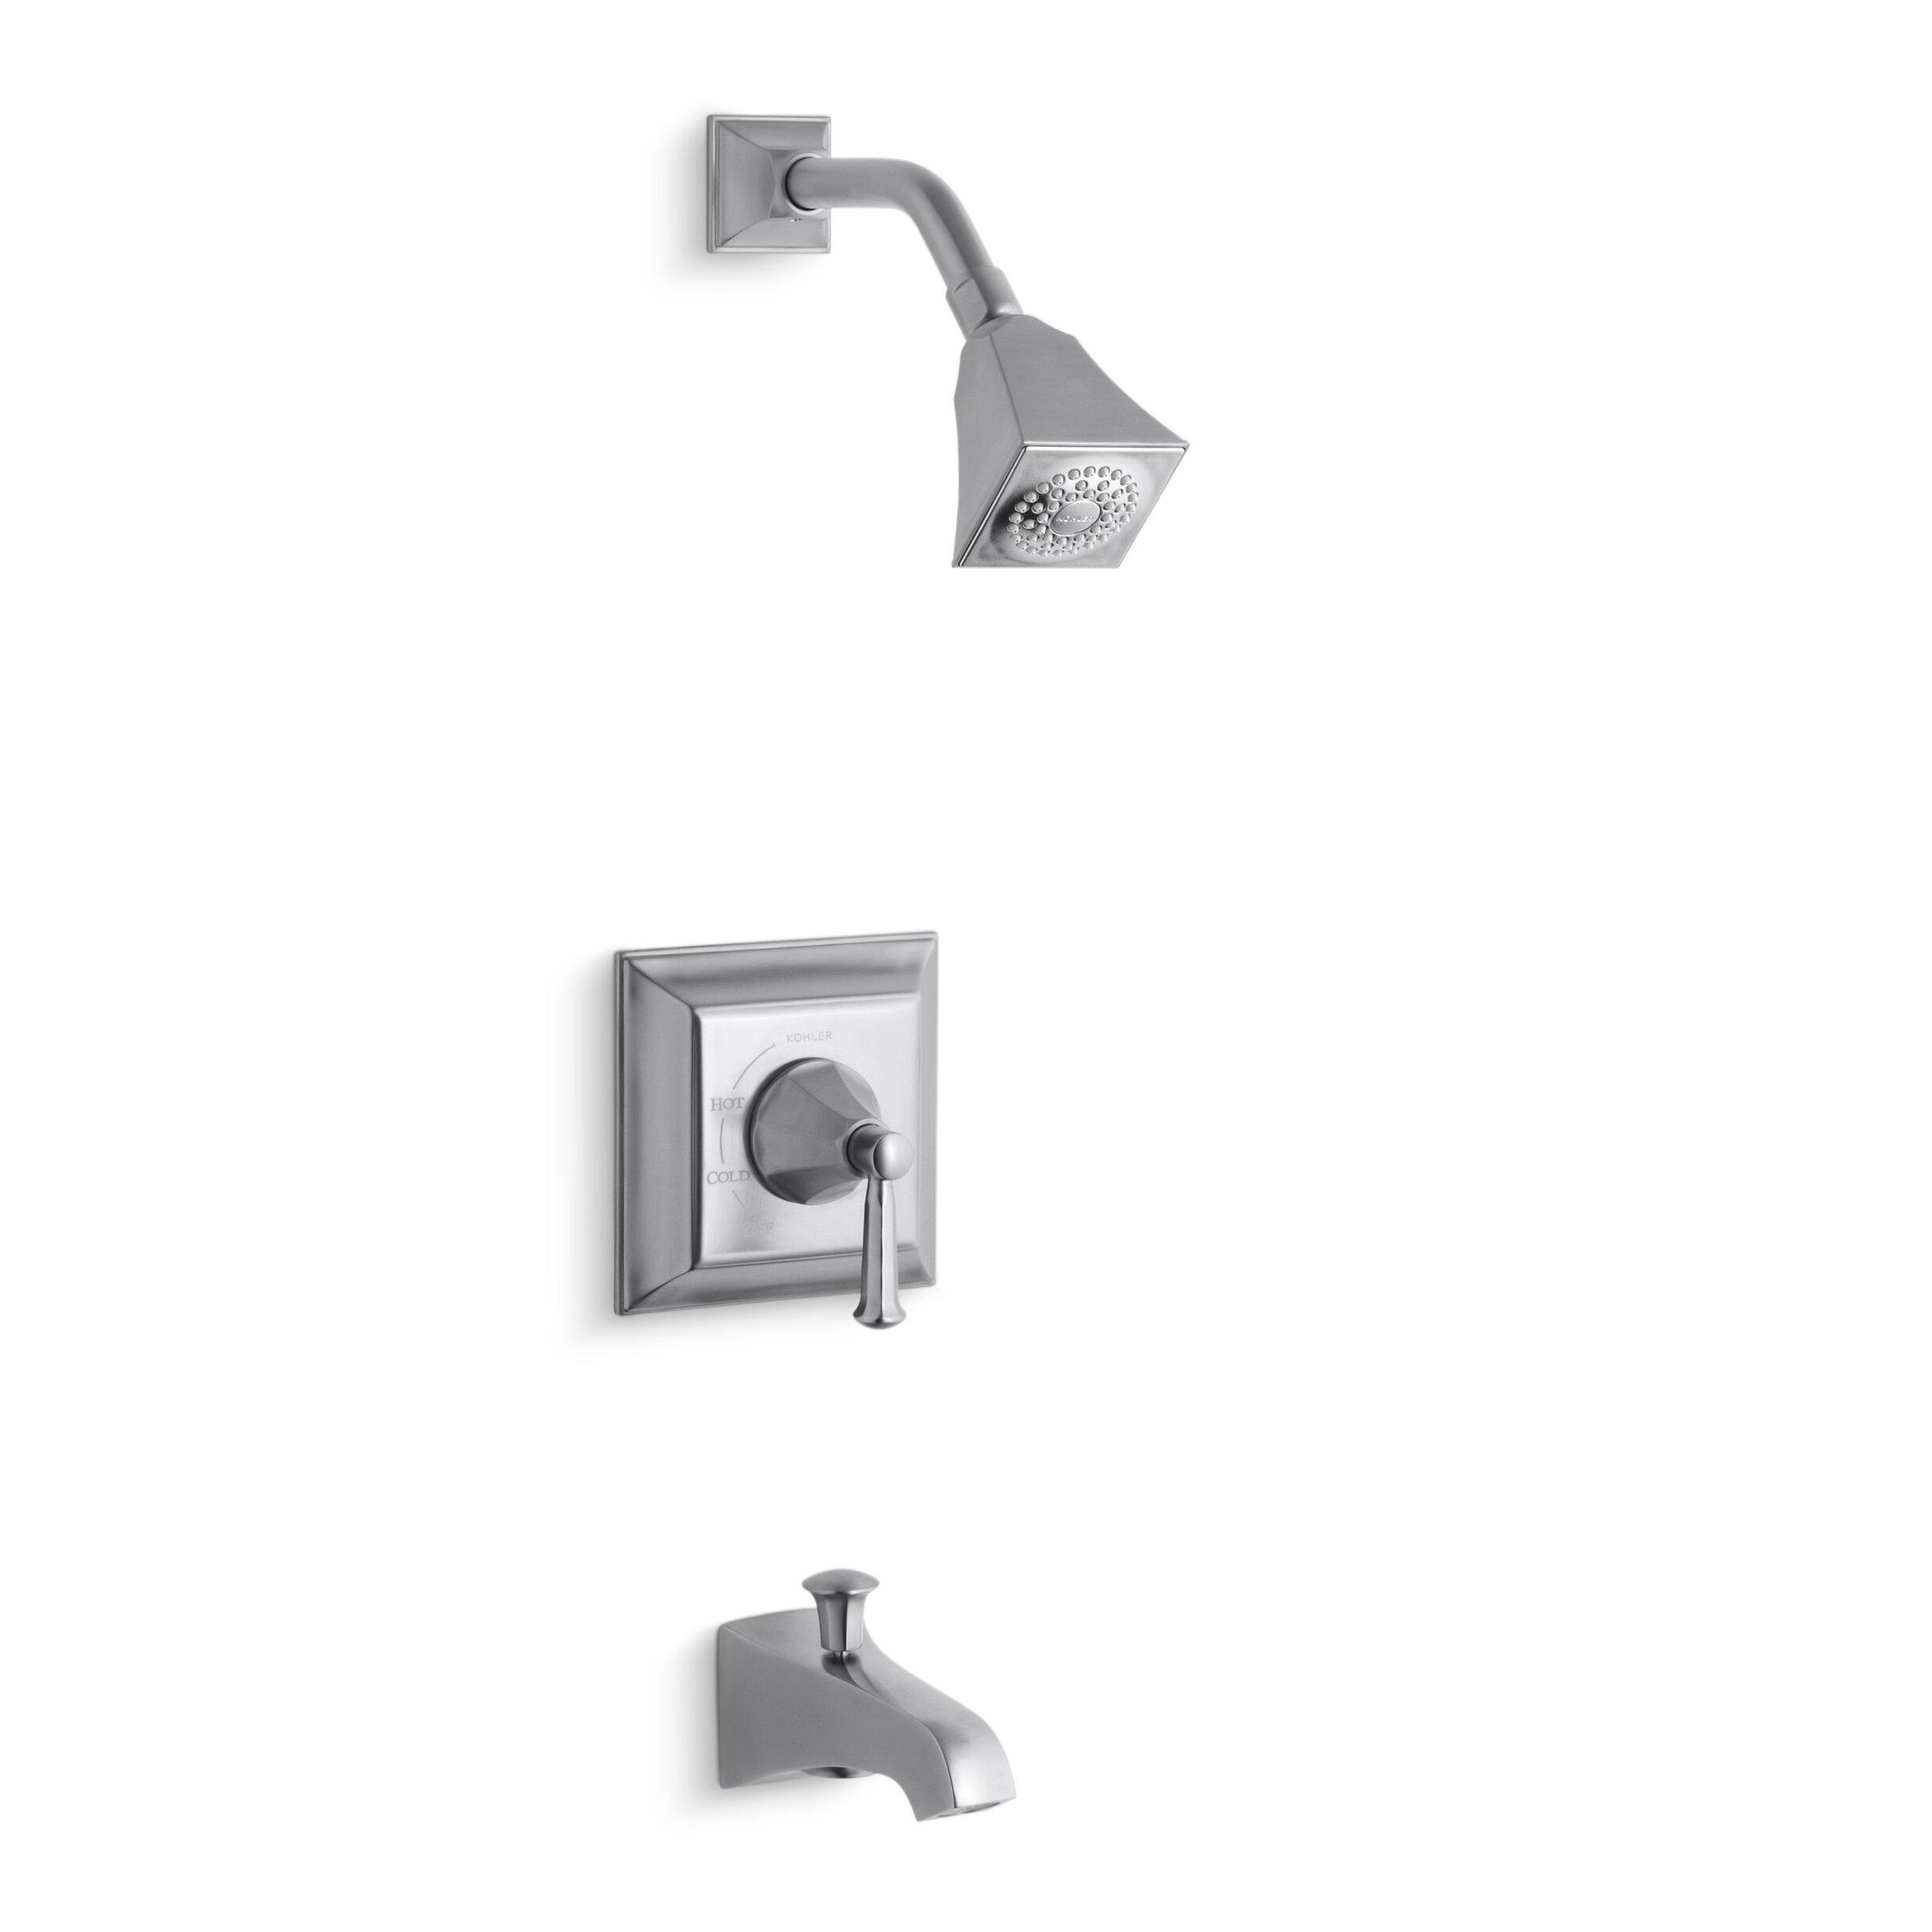 Kohler Shower Valve. Finial Traditional Ritetemp Pressure Balance ... - kohler memoirs stately ritetemp bath and shower faucet trim with lever